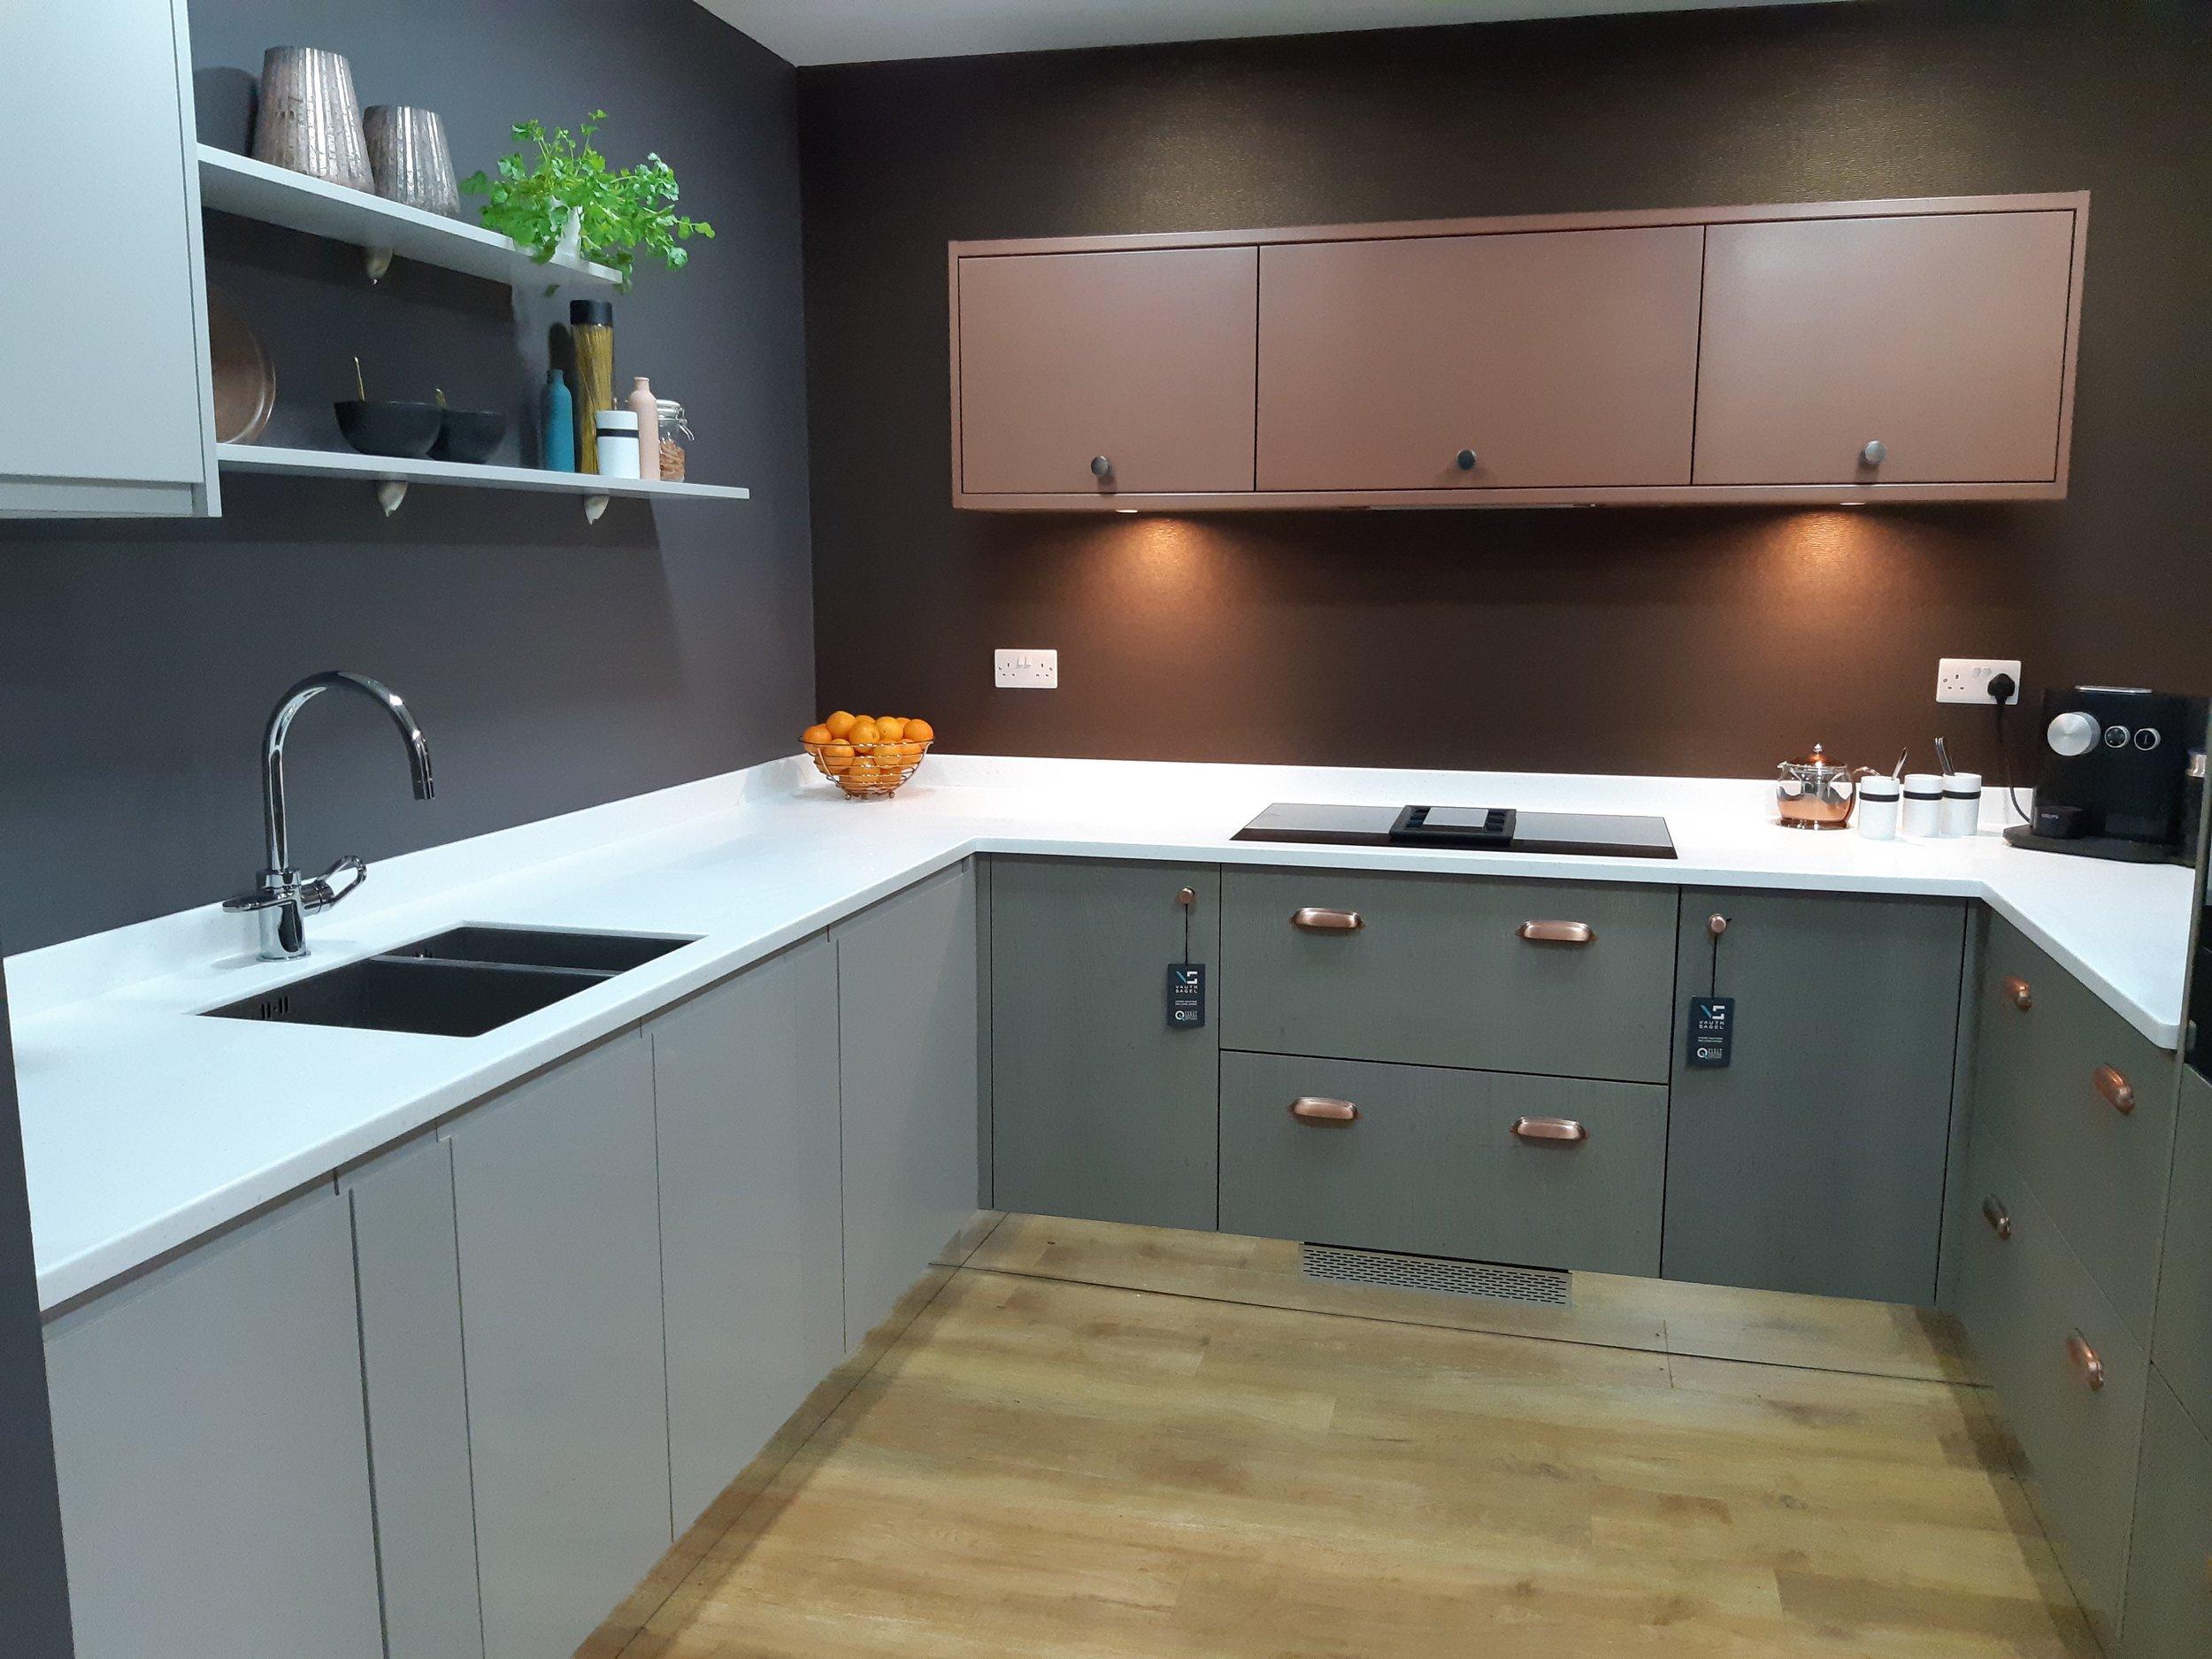 Kingsey Kitchens